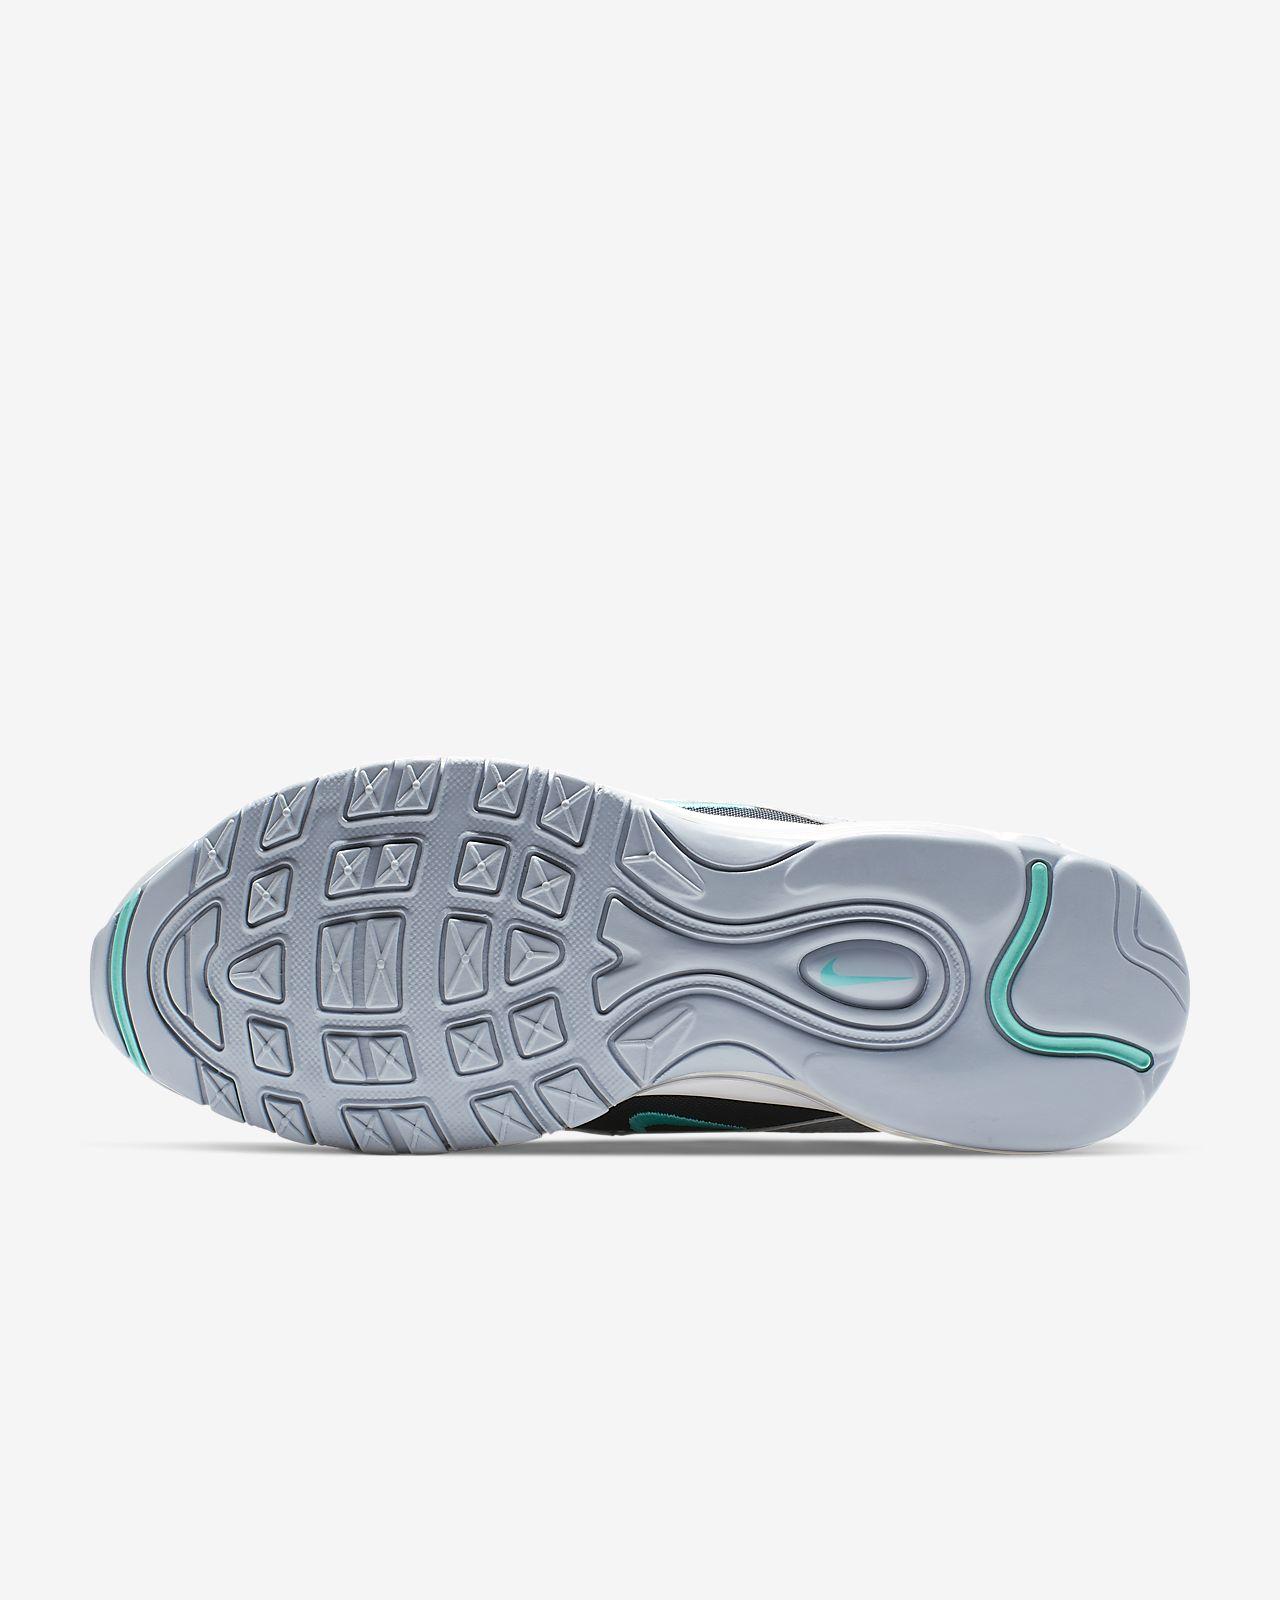 Nike Air Max 97 Essential Mens Shoes CI6392 400 Obsidian